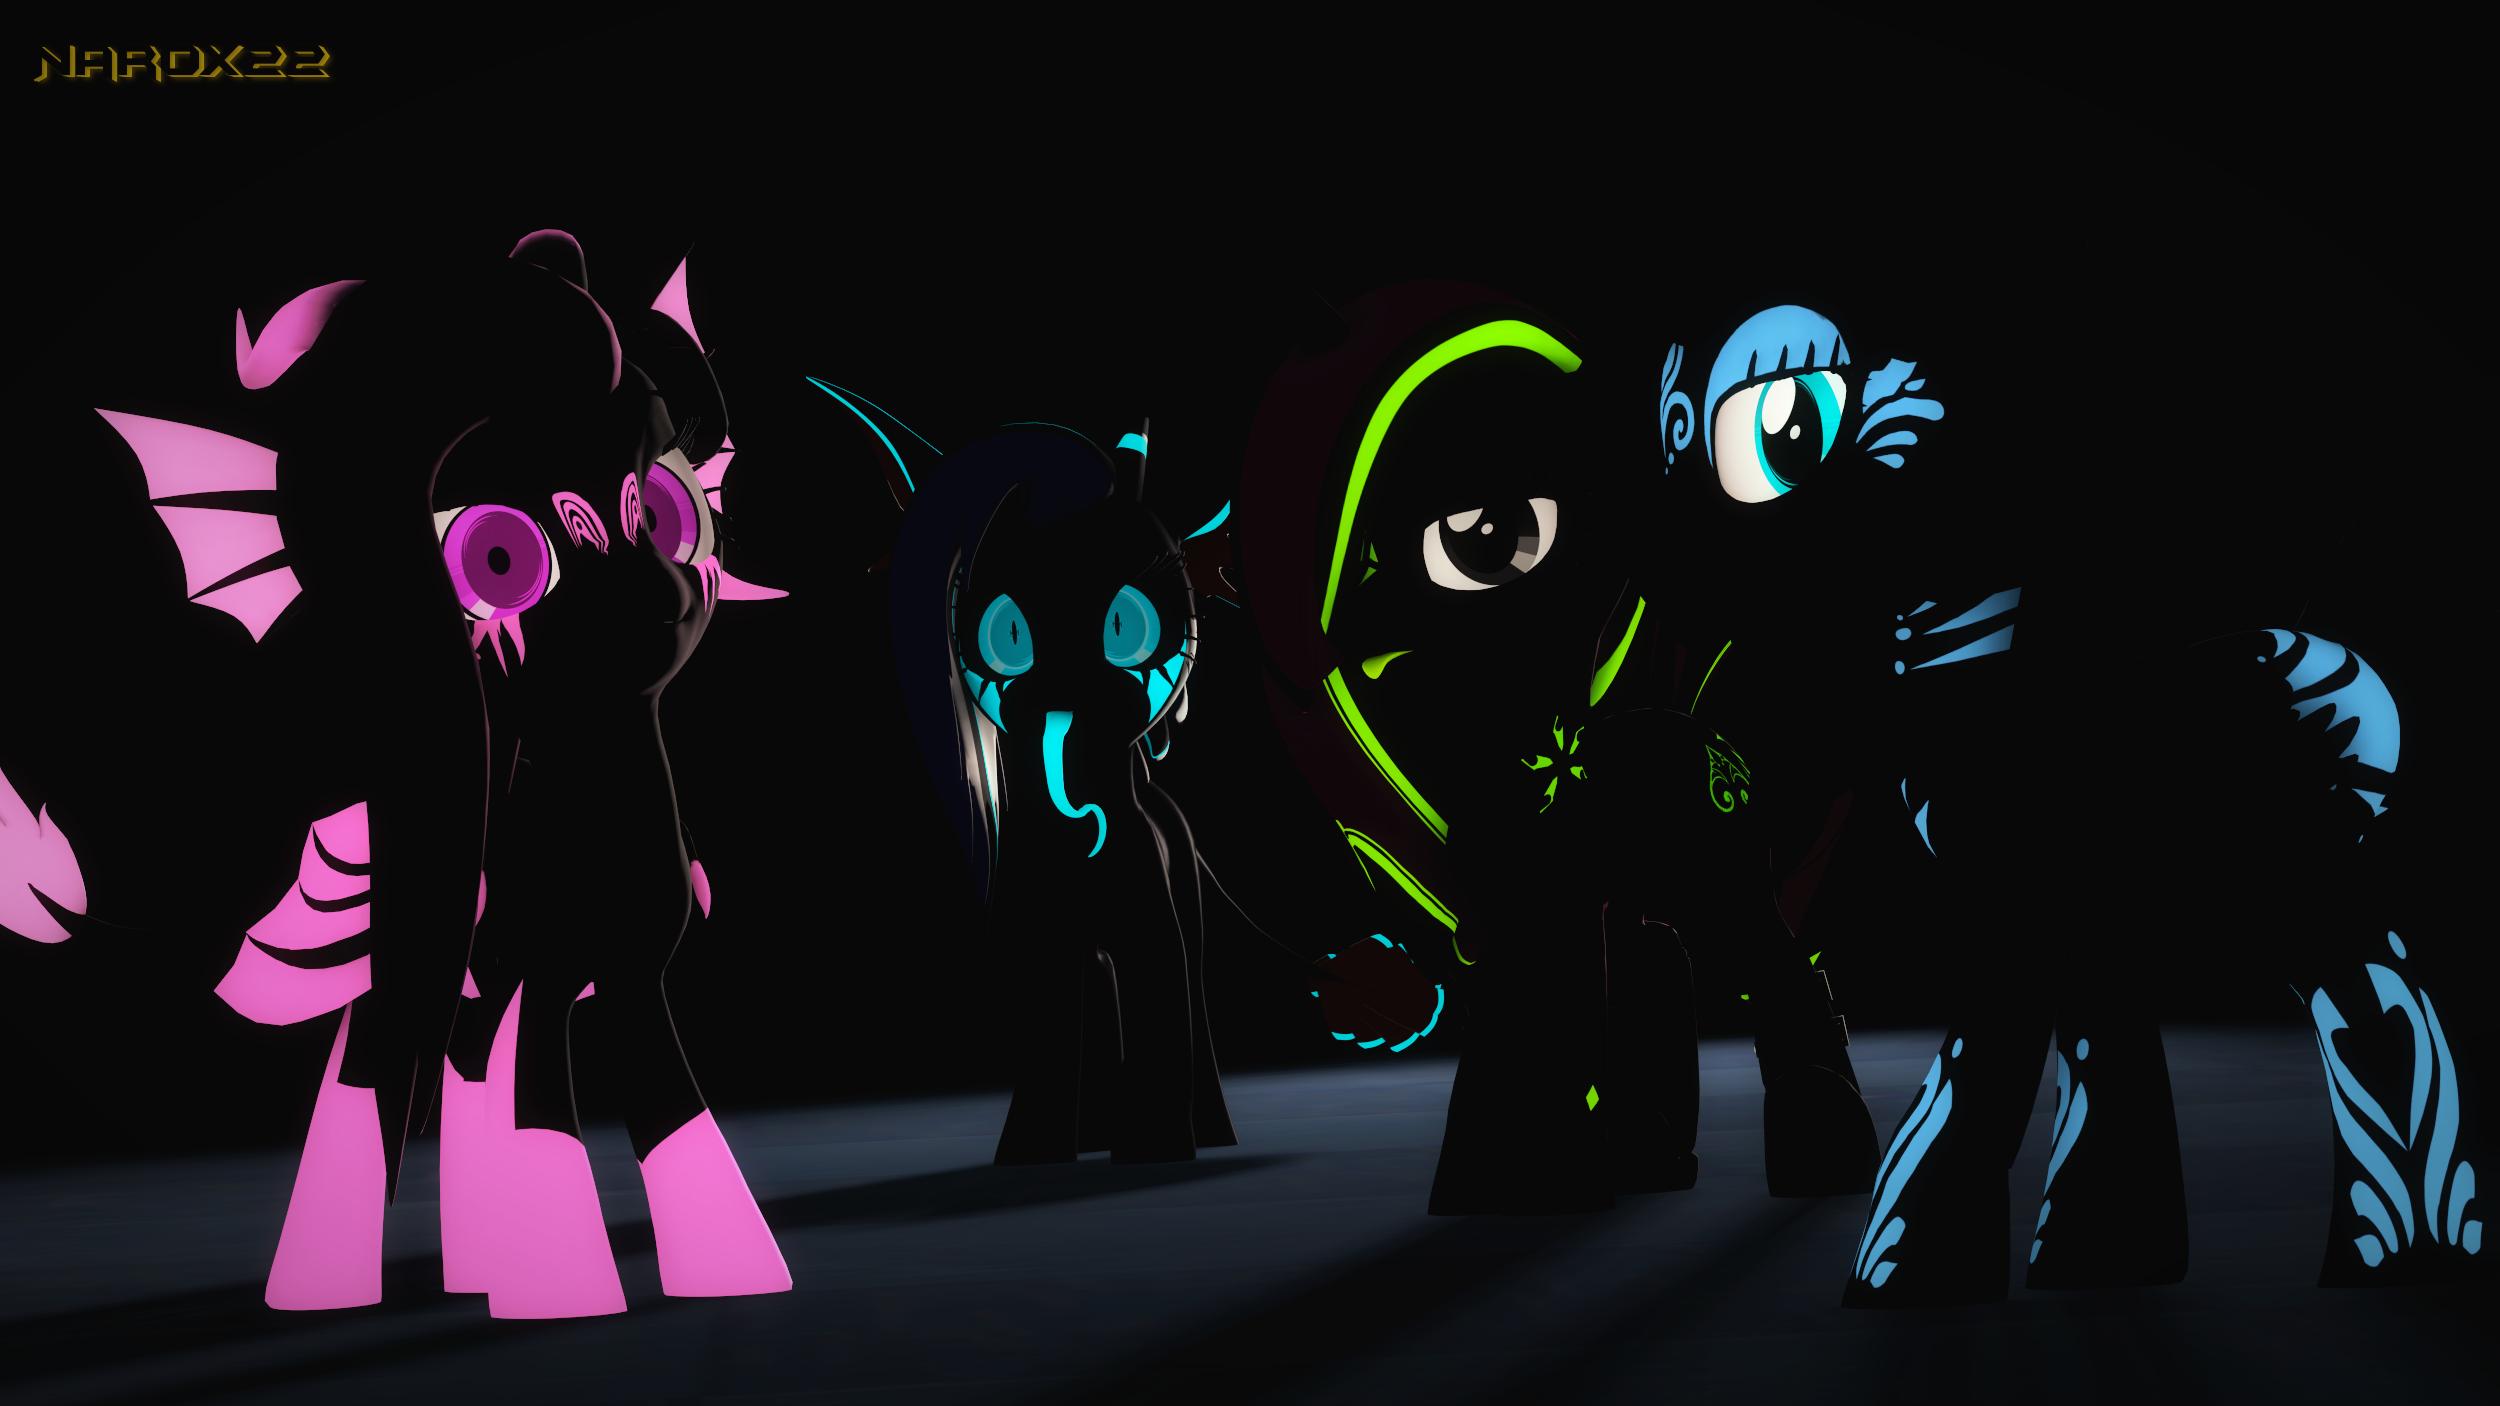 Glowy Pones by Narox22 on DeviantArt